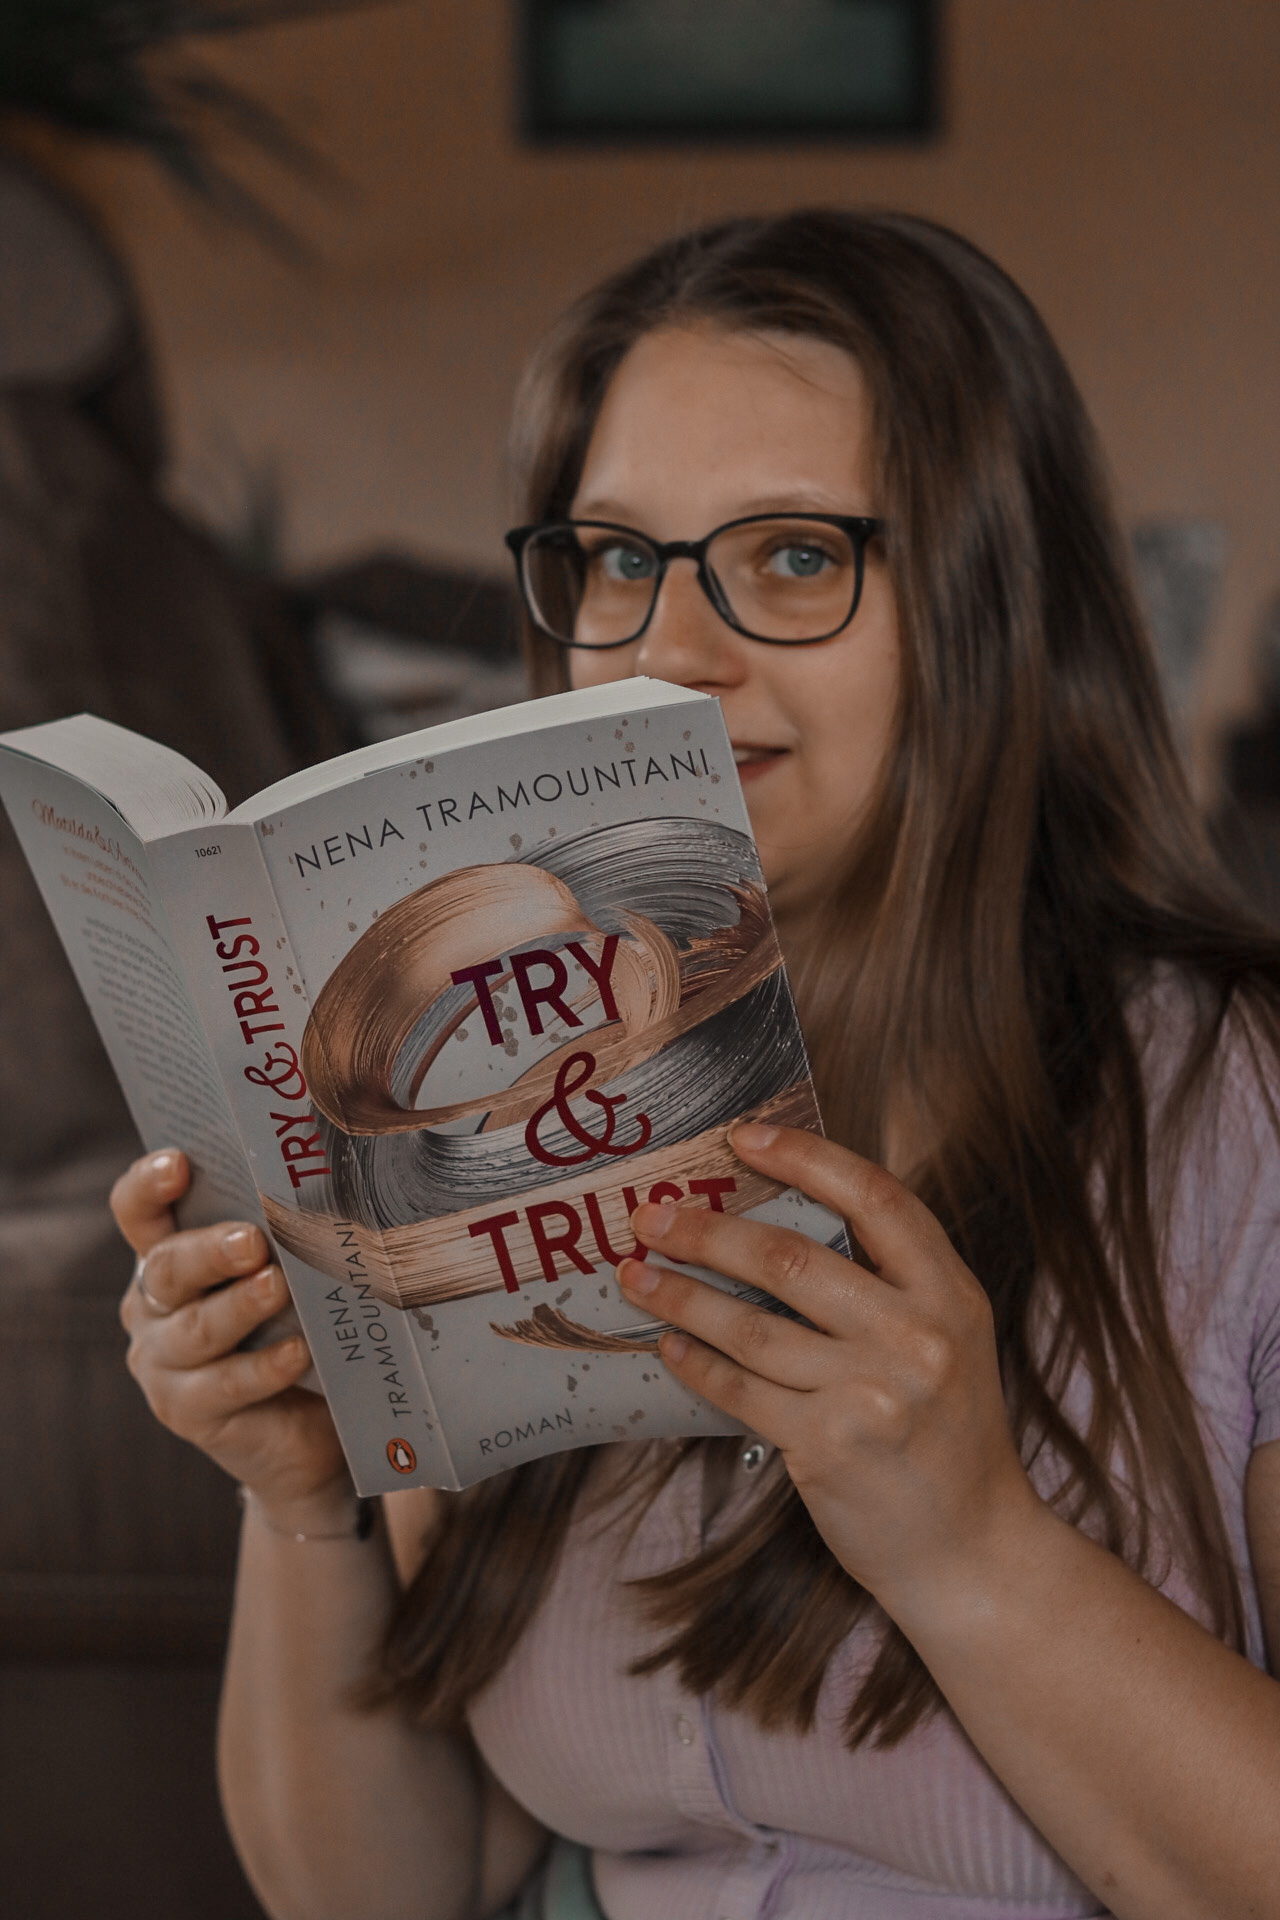 Try & Trust – Soho Love #2 | Nena Tramountani